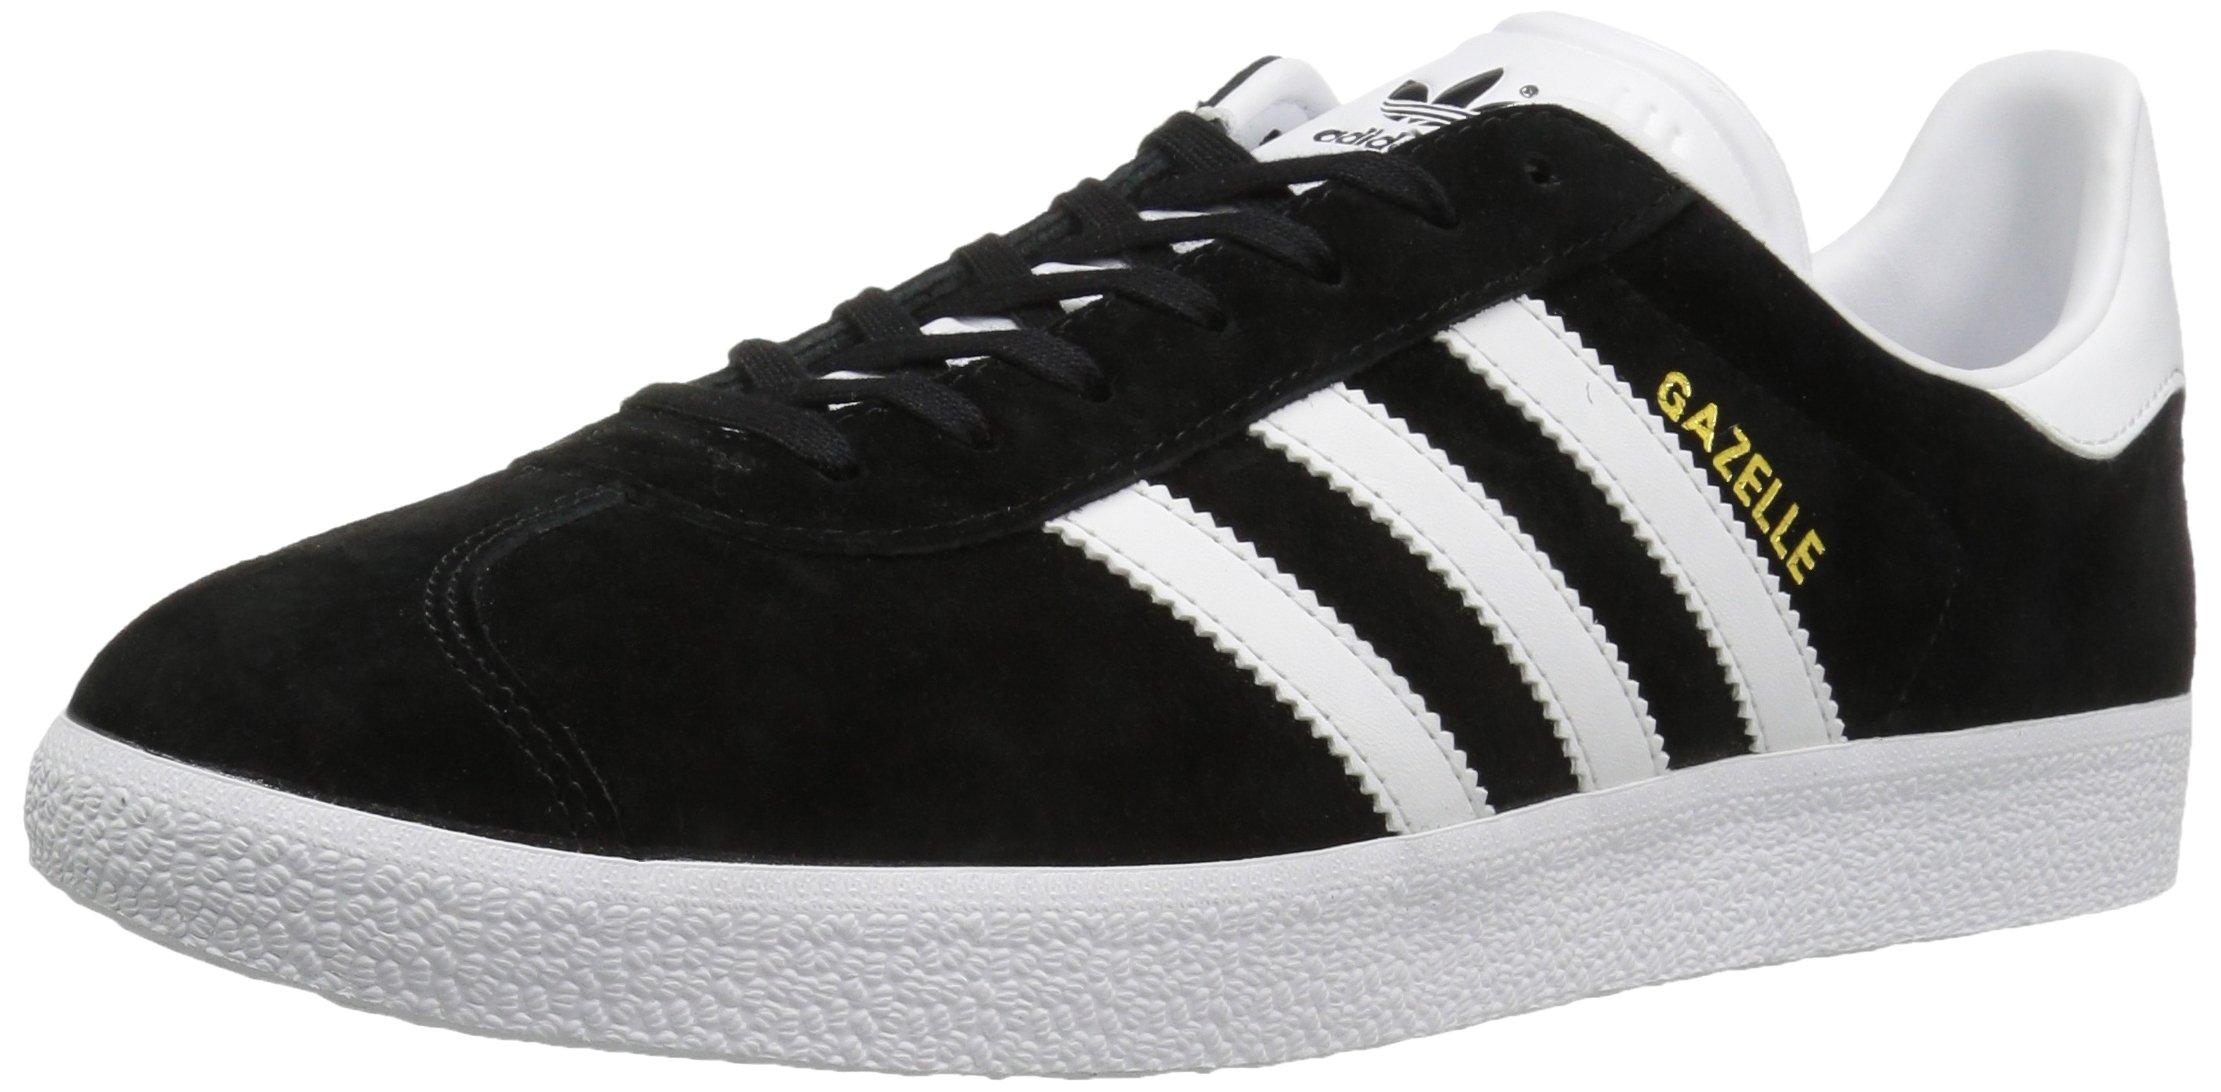 adidas Originals Men's Gazelle Lace-up Sneaker,Black/White/Gold Met,9.5 M US